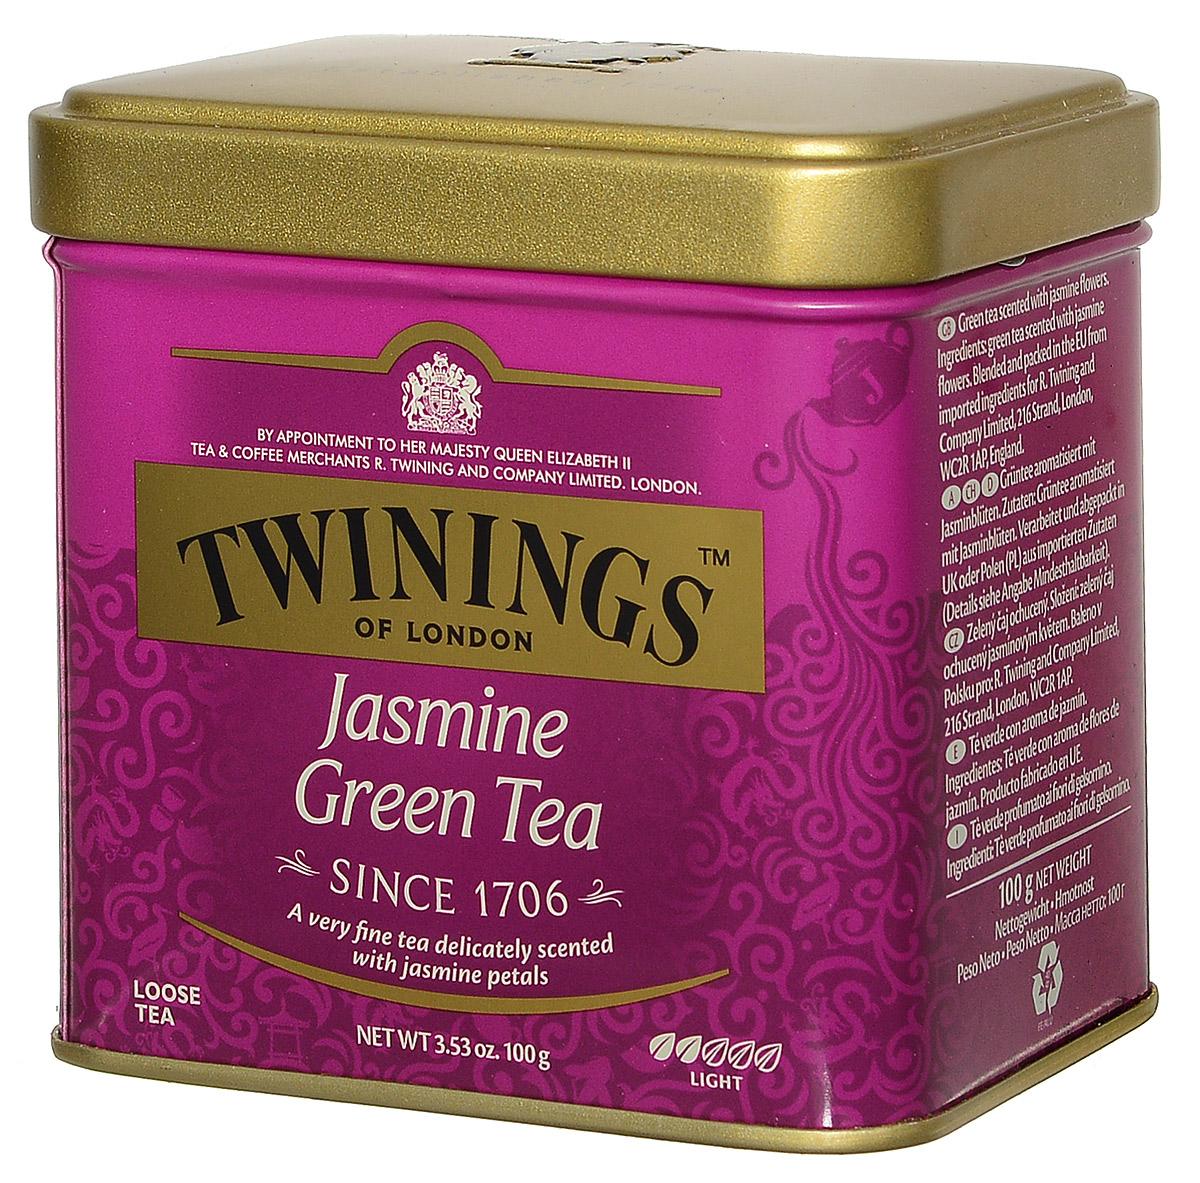 Twinings Jasmine Tea зеленый листовой чай с жасмином, 100 г (ж/б) free shipping 2015 yr new tea premium jasmine pearl tea jasmine longzhu flower tea green tea 250g bag vacuum packaging